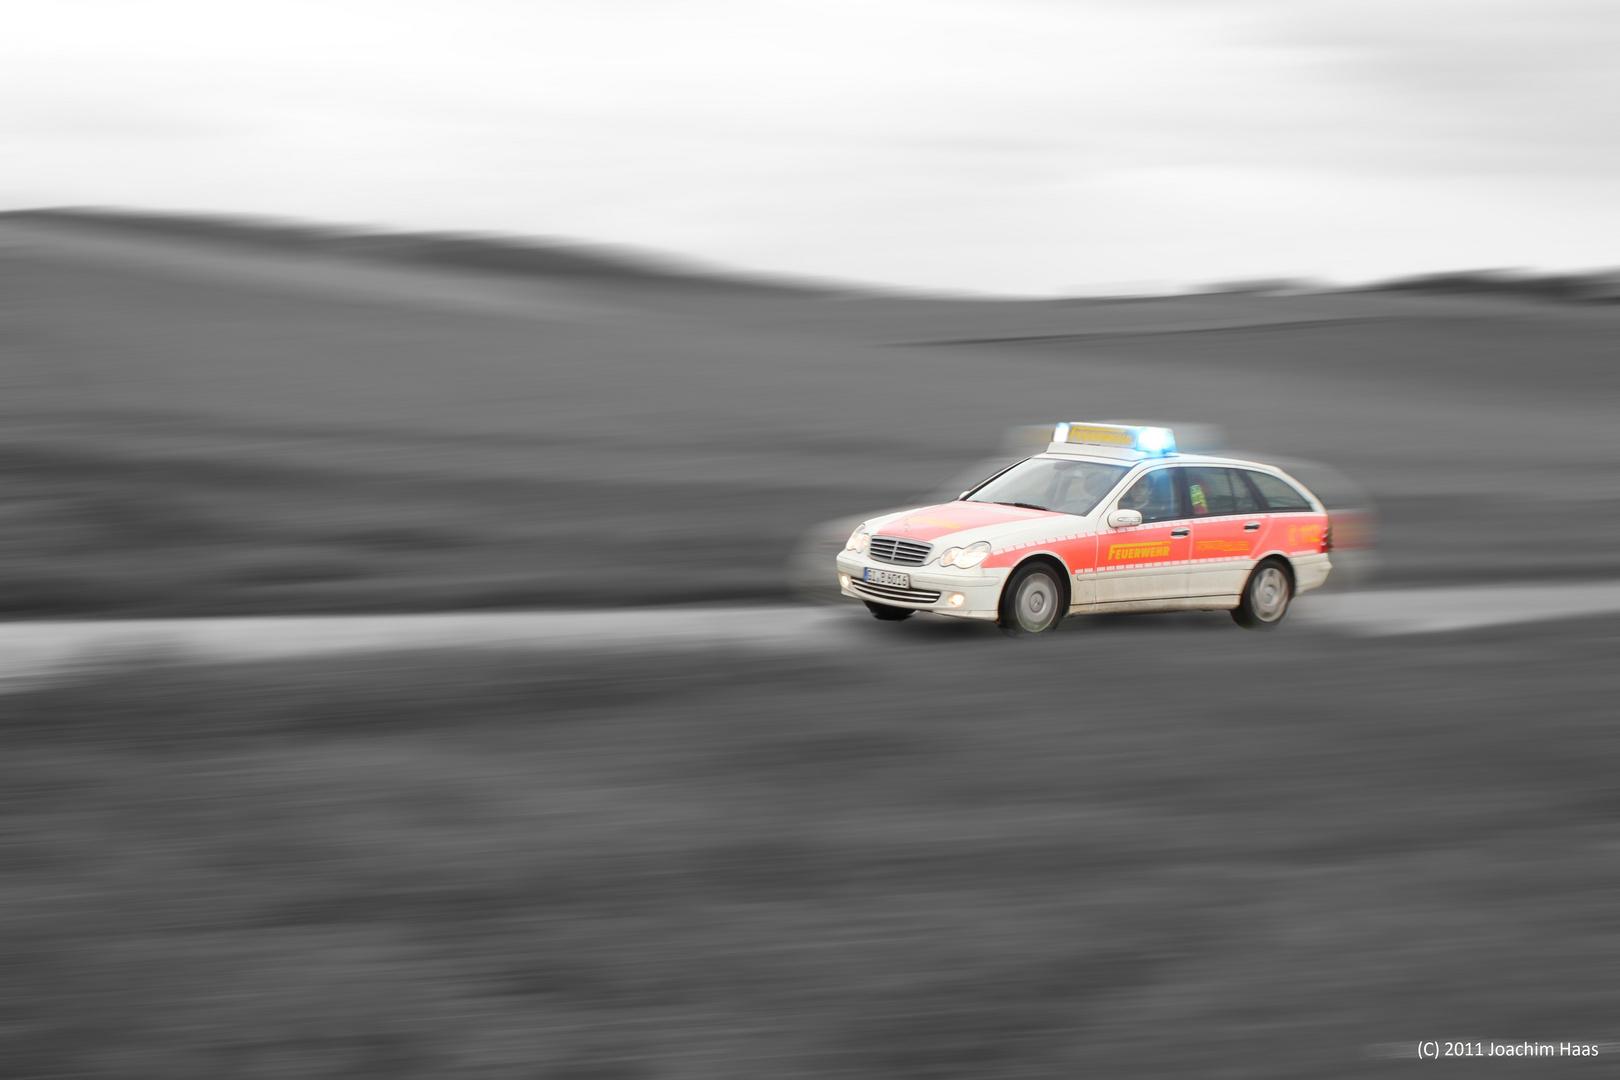 Voraushelferfahrzeug Florian Buseck 1-16-1